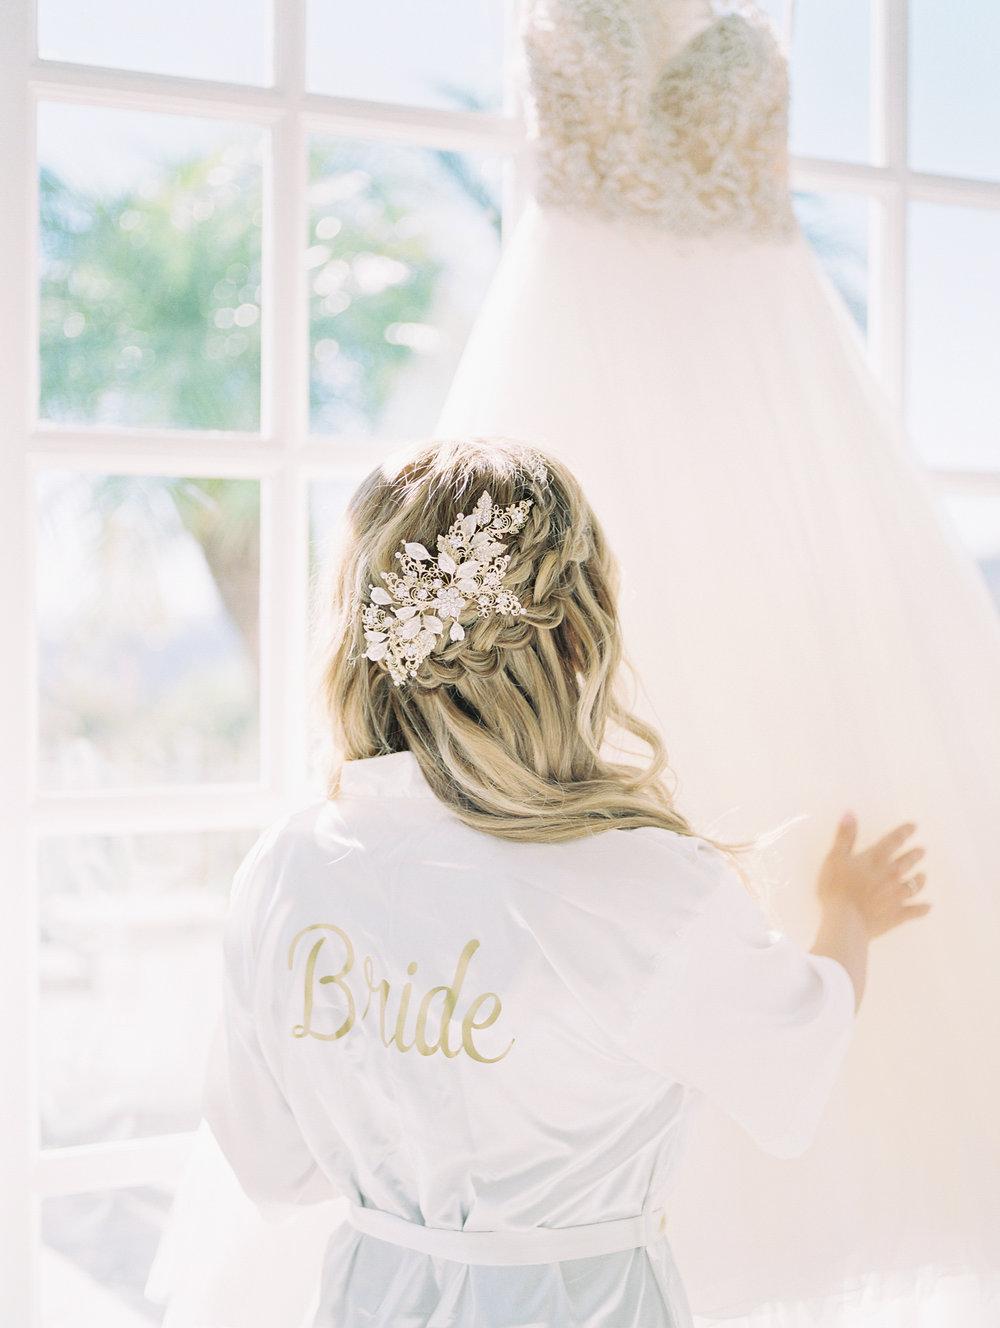 san-diego-thevanitybelle.com-bride-bride hair-wedding hair stylist-half-up-do-twisted braids-